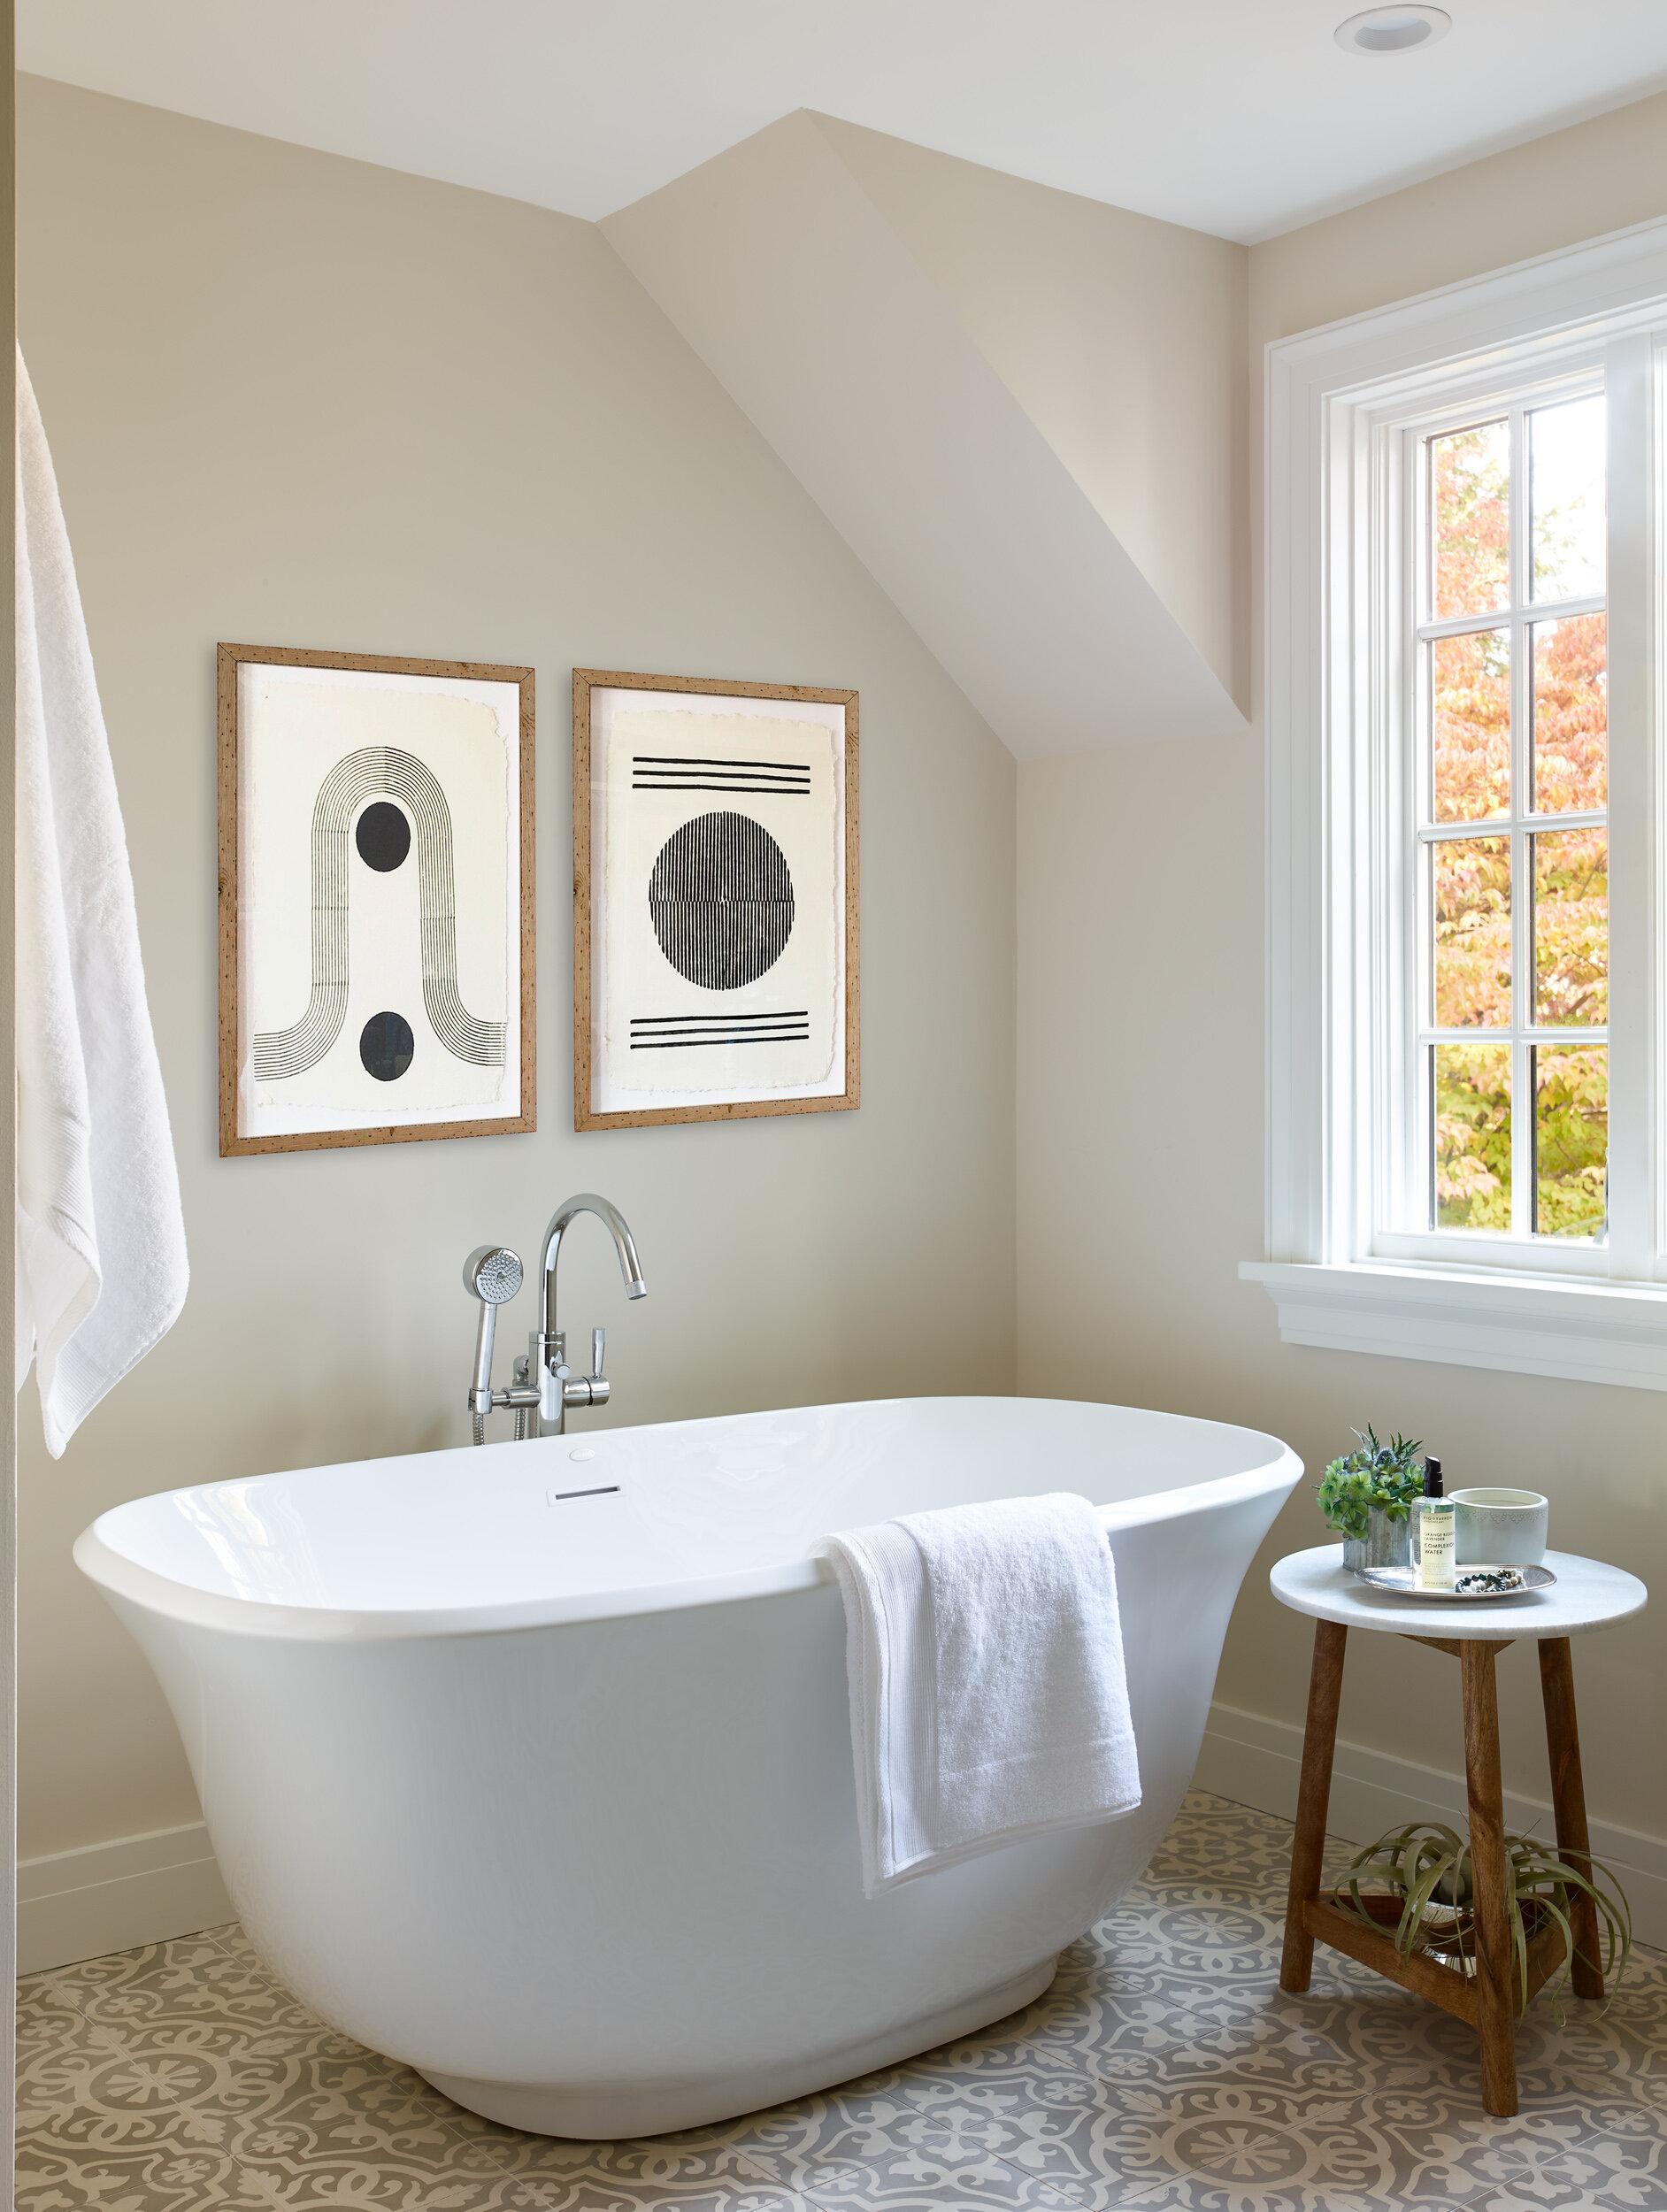 mackenzie-and-company-boston-westwood-interior-design-master-bathroom-style-4